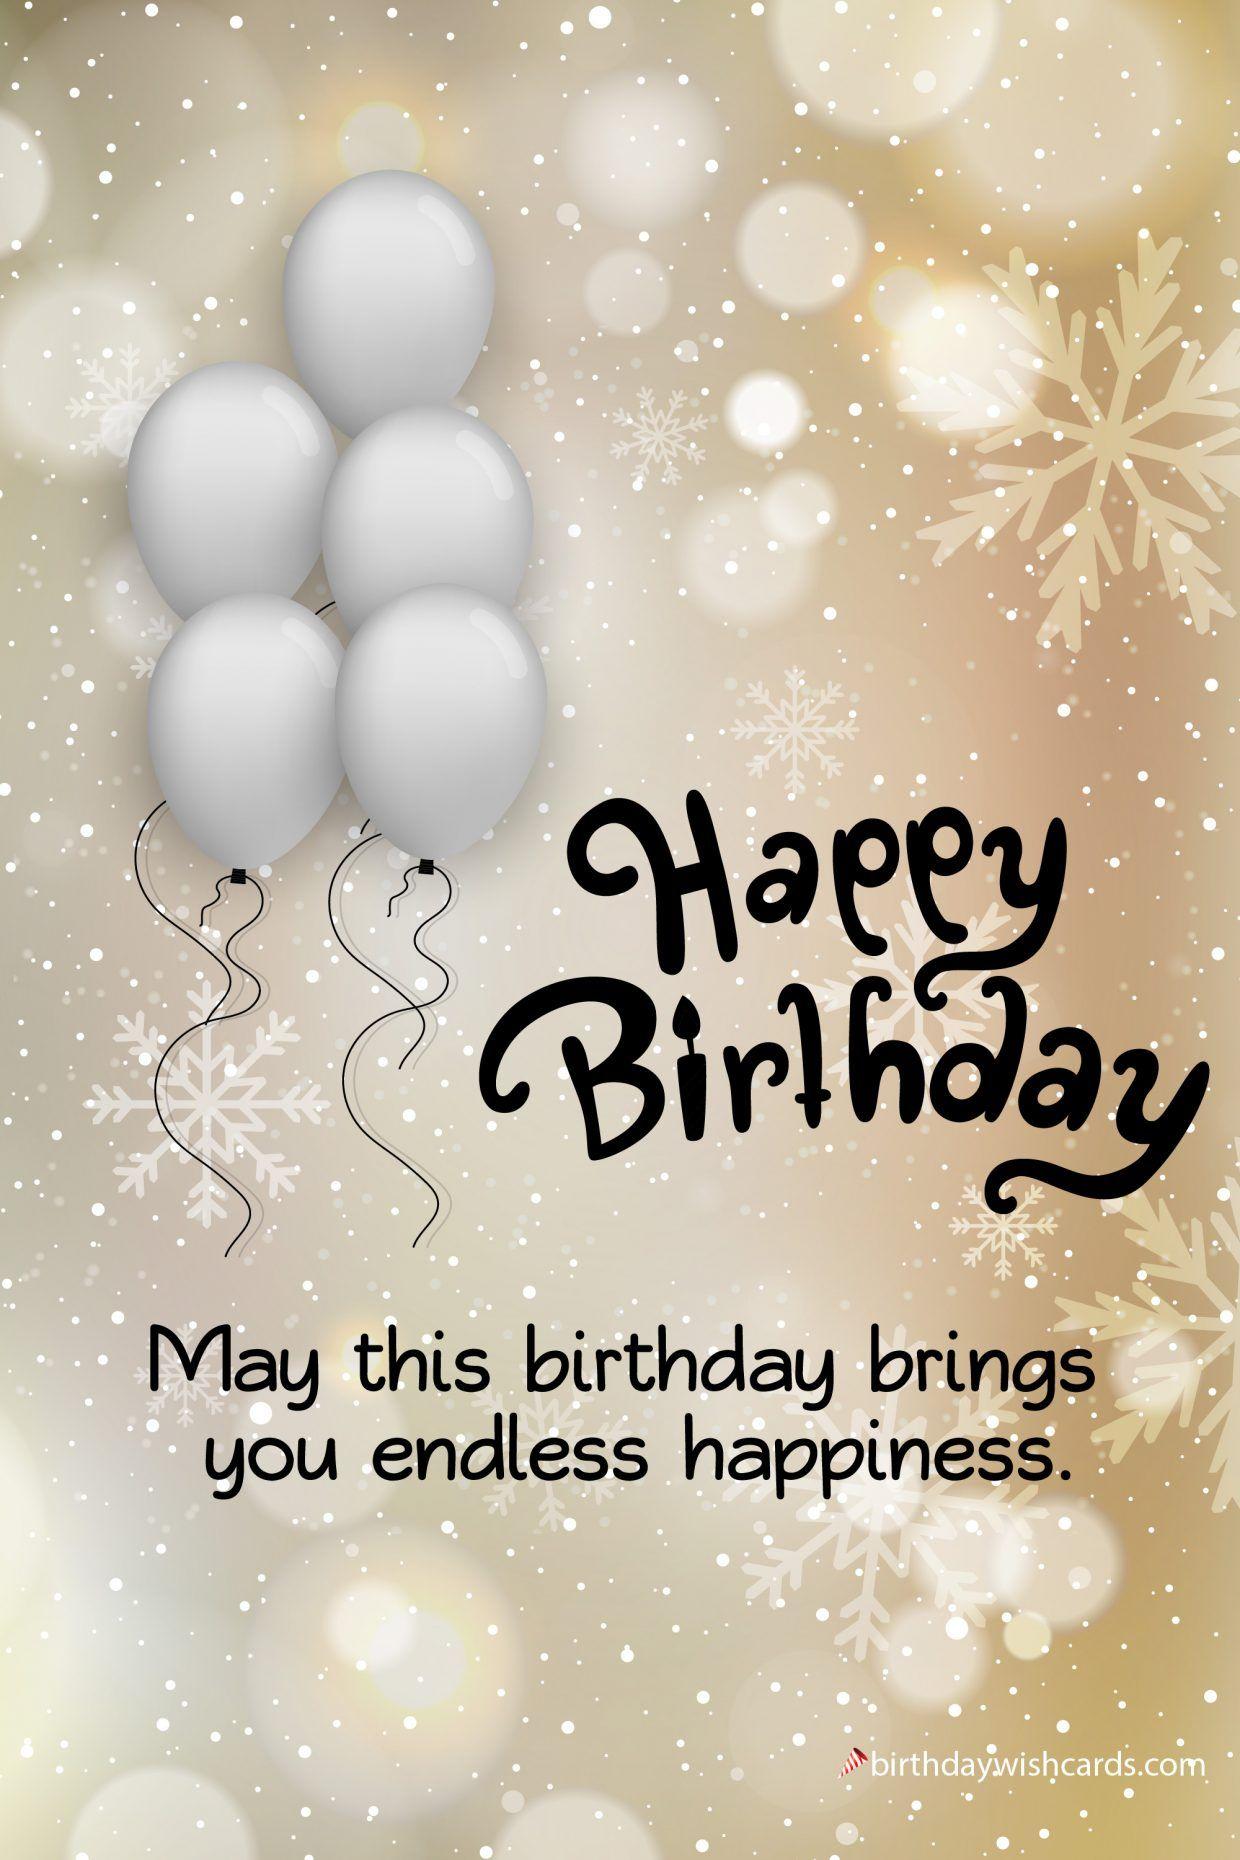 Happy Birthday Wish Image Birthday Wish Cards Happy Birthday Wishes Quotes Happy Birthday Wishes Cards Happy Birthday Wishes Images